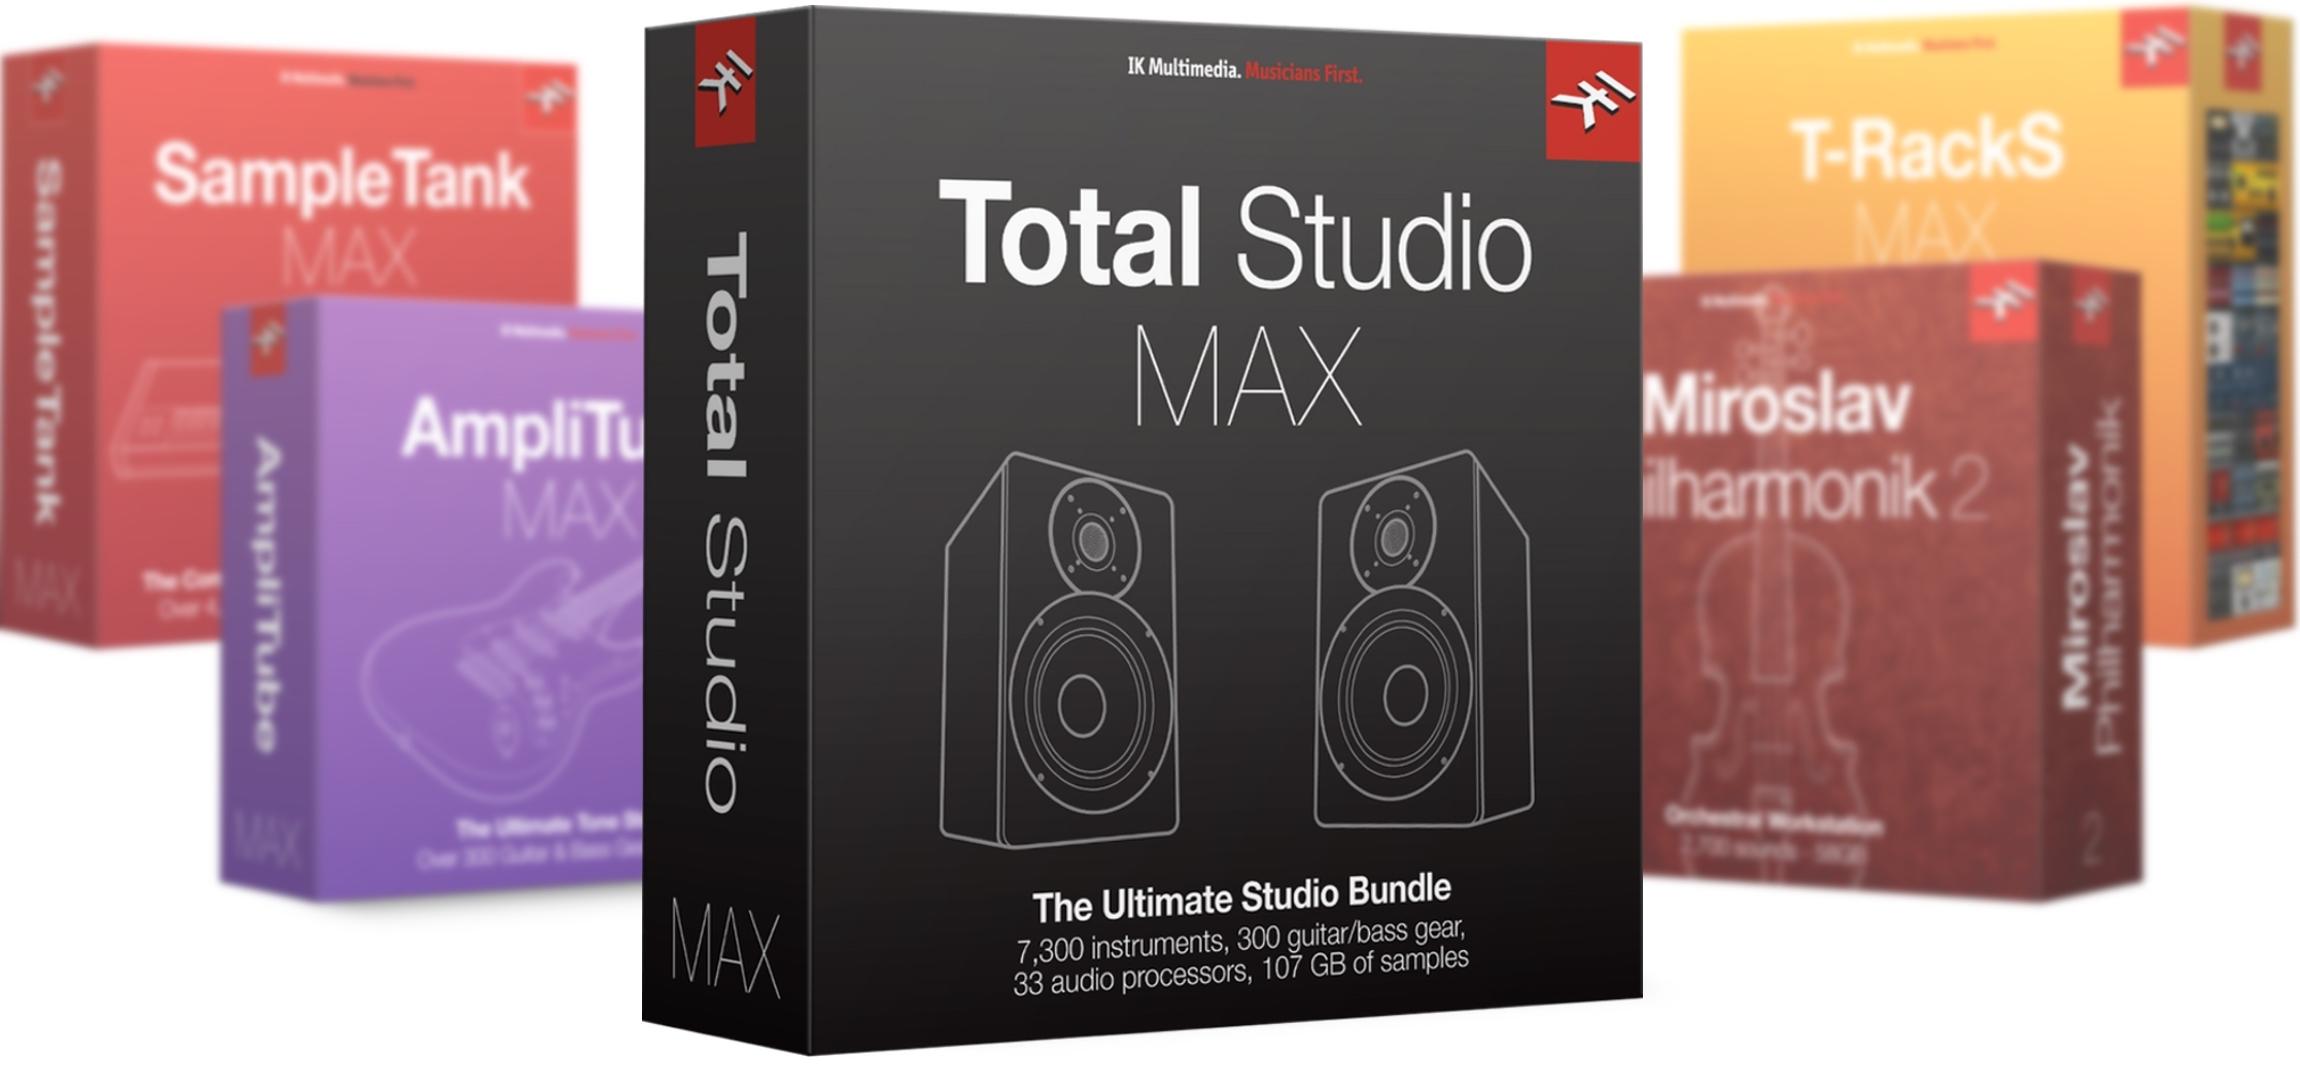 Total Studio MAX